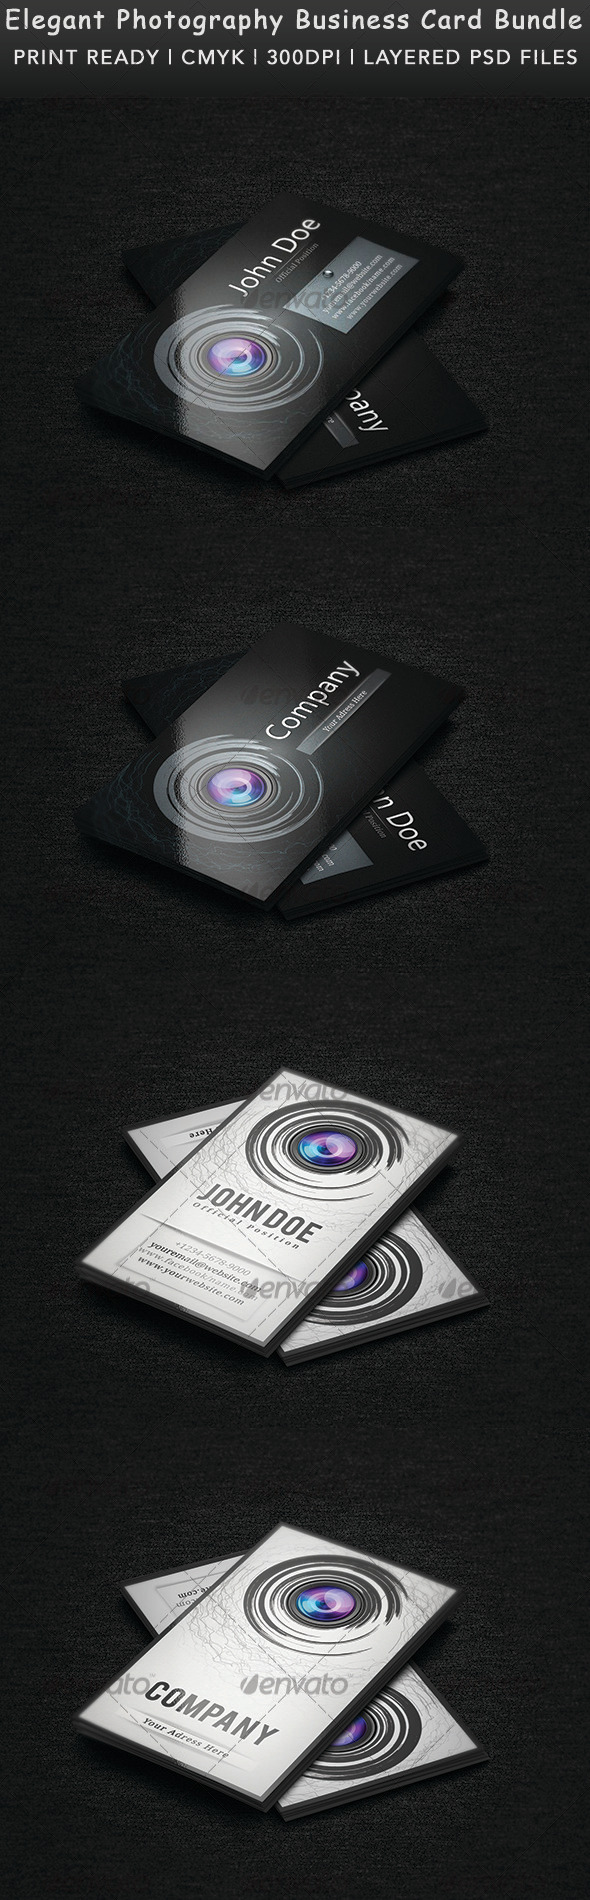 Elegant Photography Business Card Bundle - Creative Business Cards